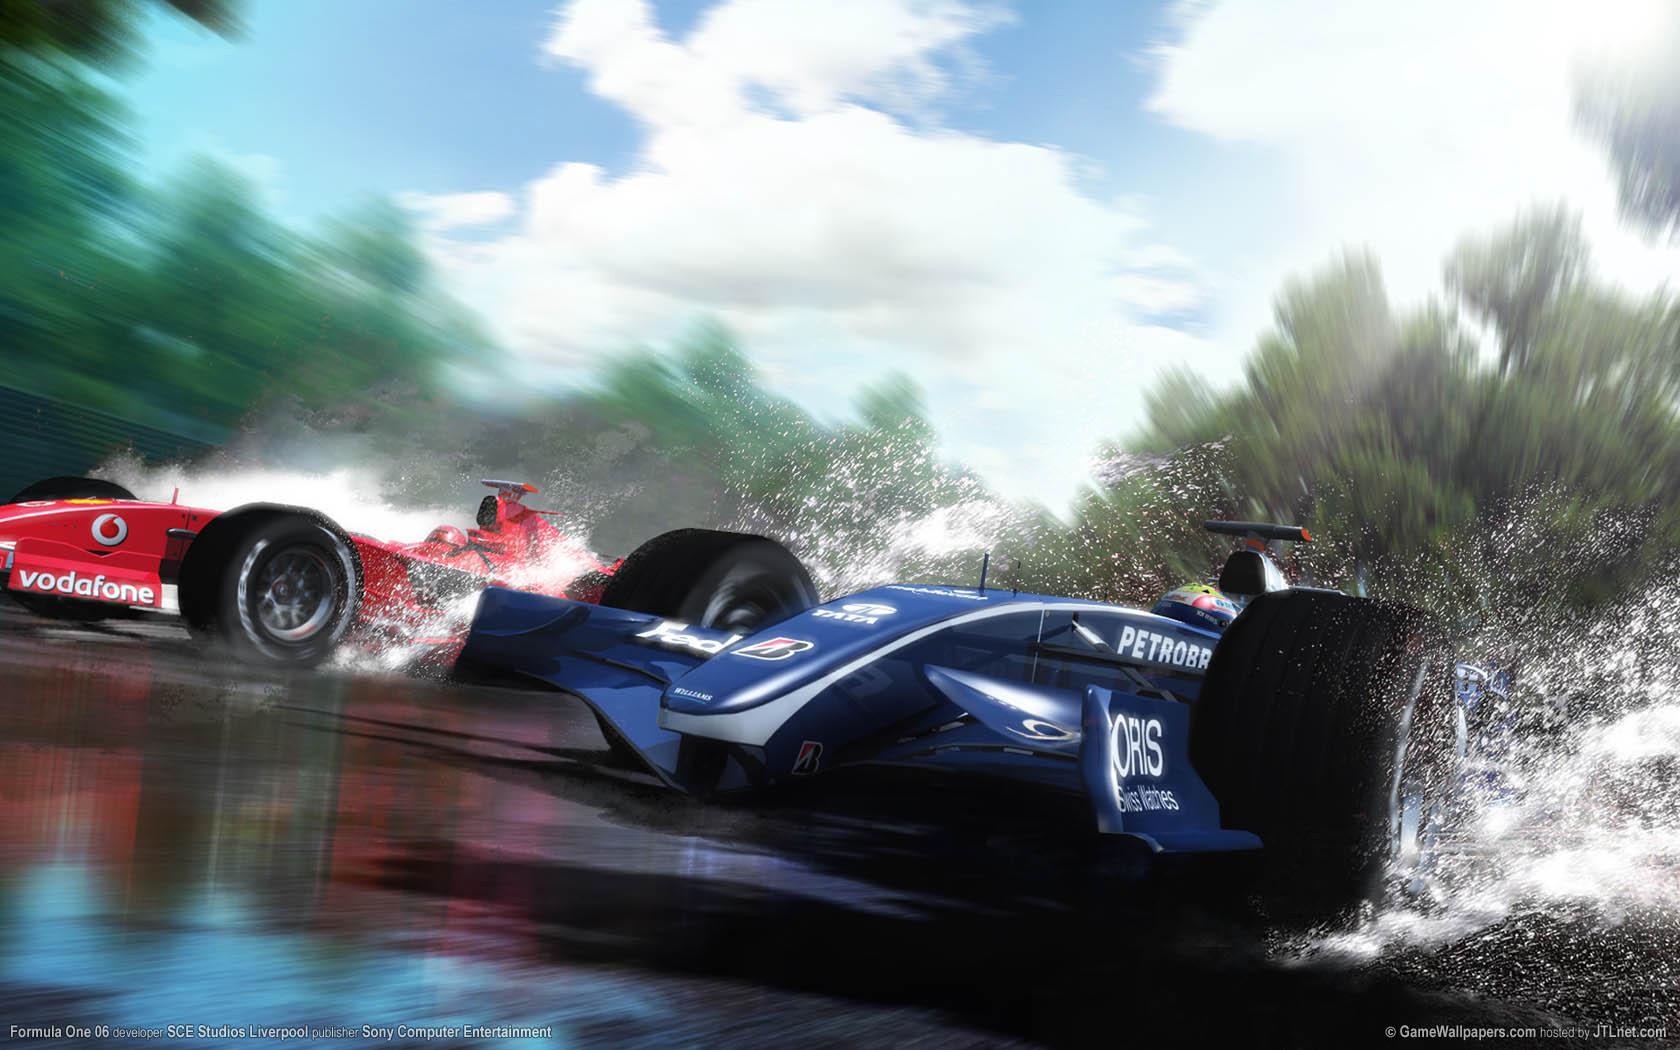 Formula One 06 Hintergrundbild 02 1680x1050